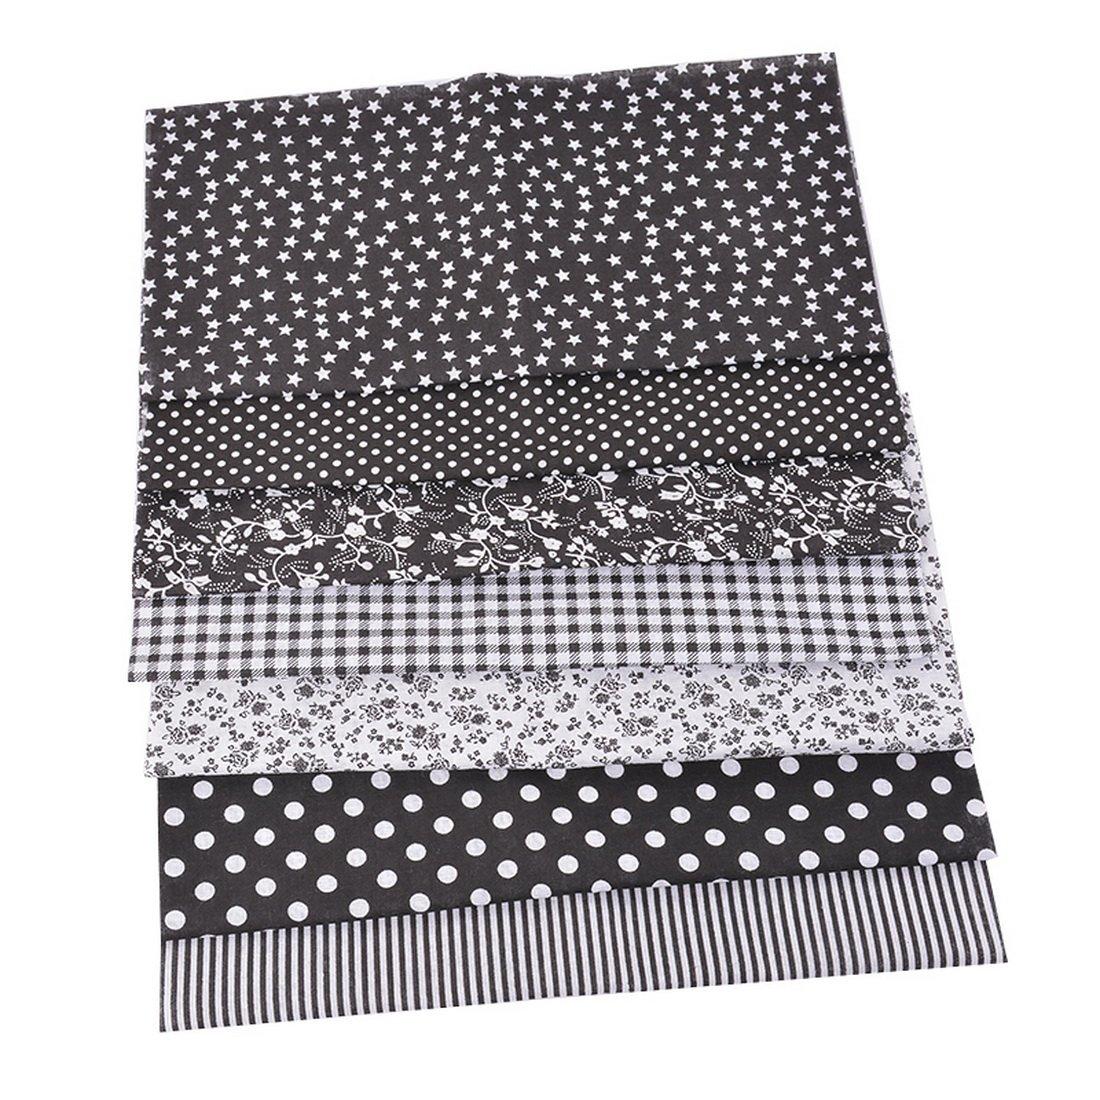 Souarts tela de flores paquetes acolchar costura patchwork ...